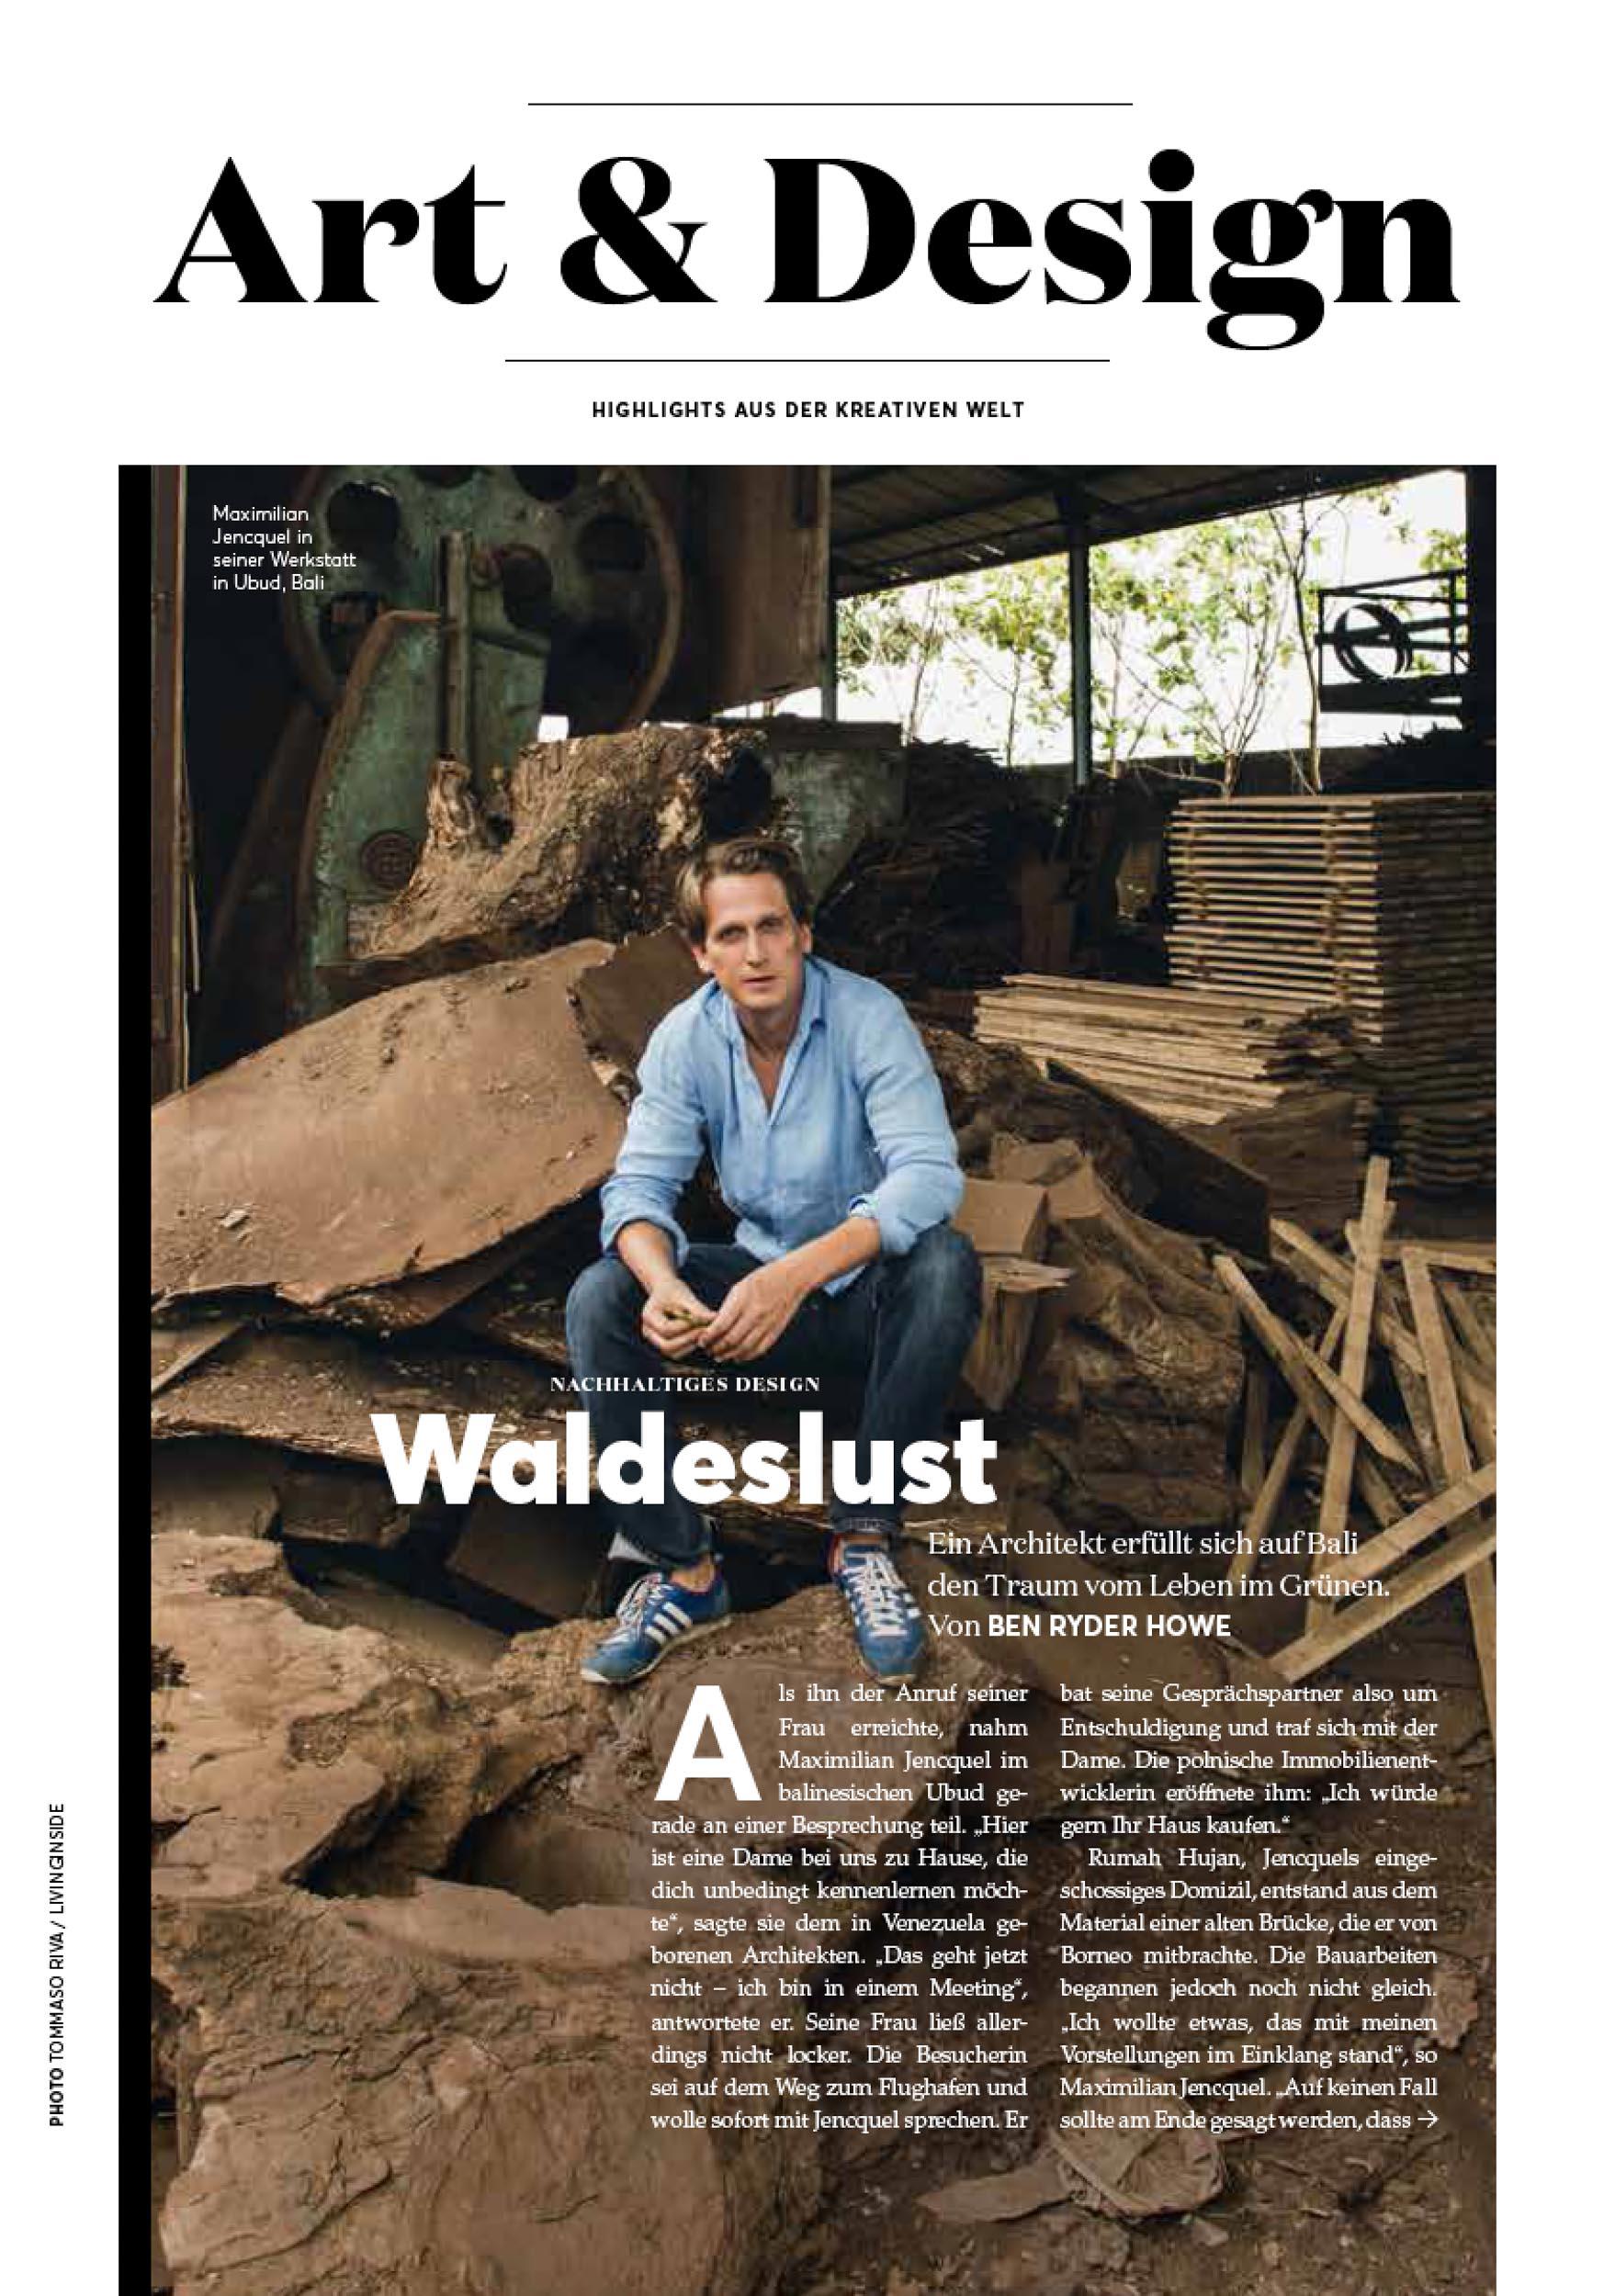 centurion-magazine-max-jencquel-bali-tommaso-riva-lisa-scappin-interiors (1 of 2).jpg